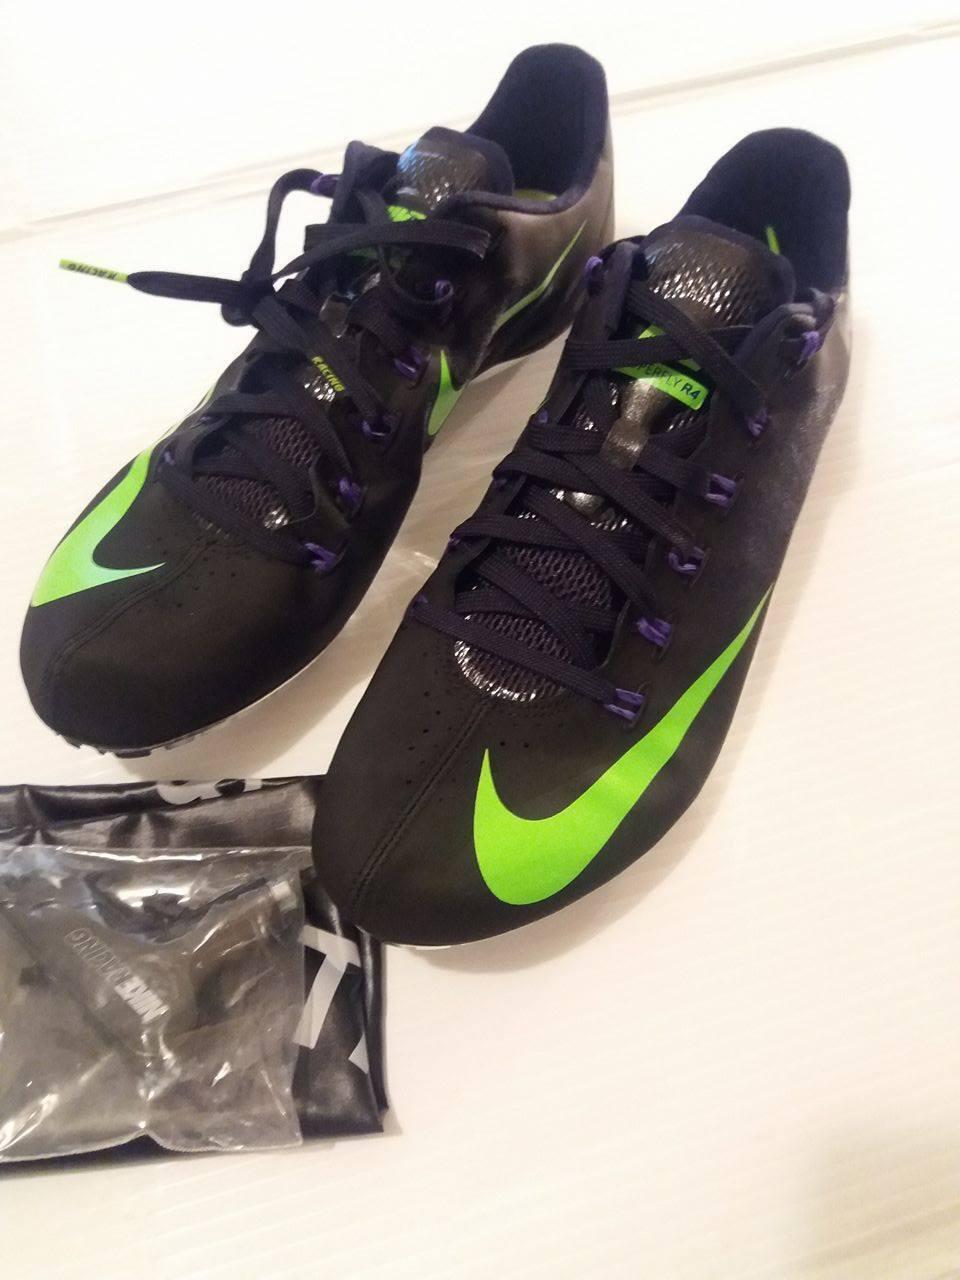 Nike Zoom Superfly R4 Picos De Zapatos Para Para Zapatos Correr Negro Verde Plata 526626-035 464af9